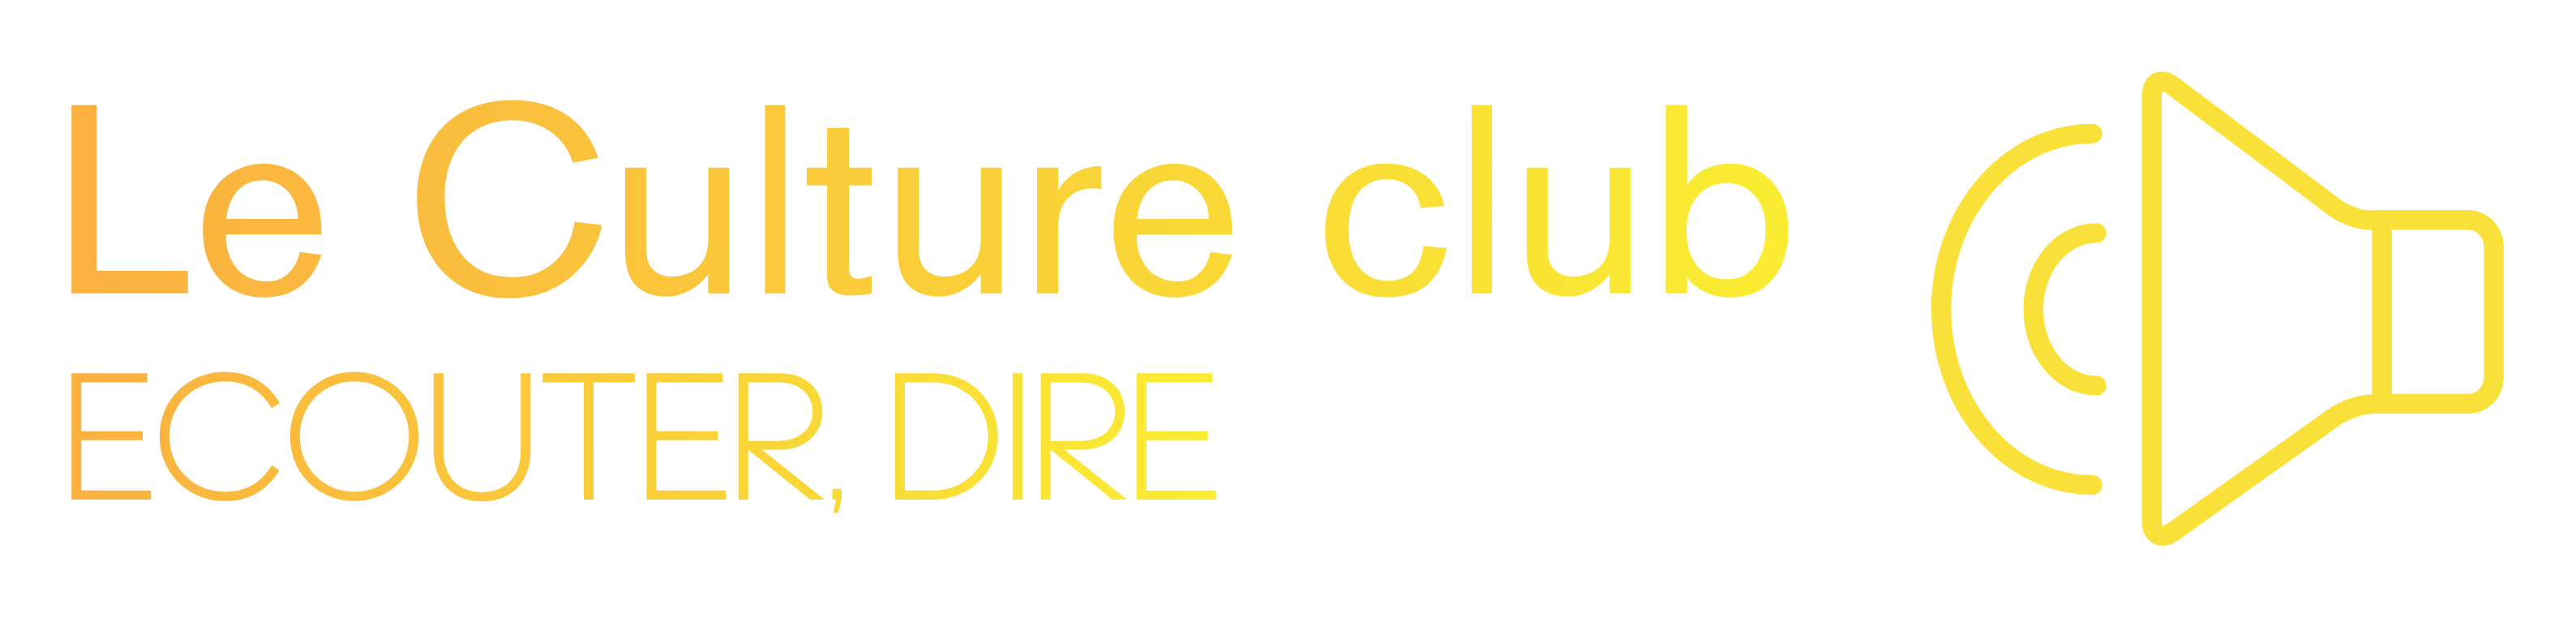 Le culture club